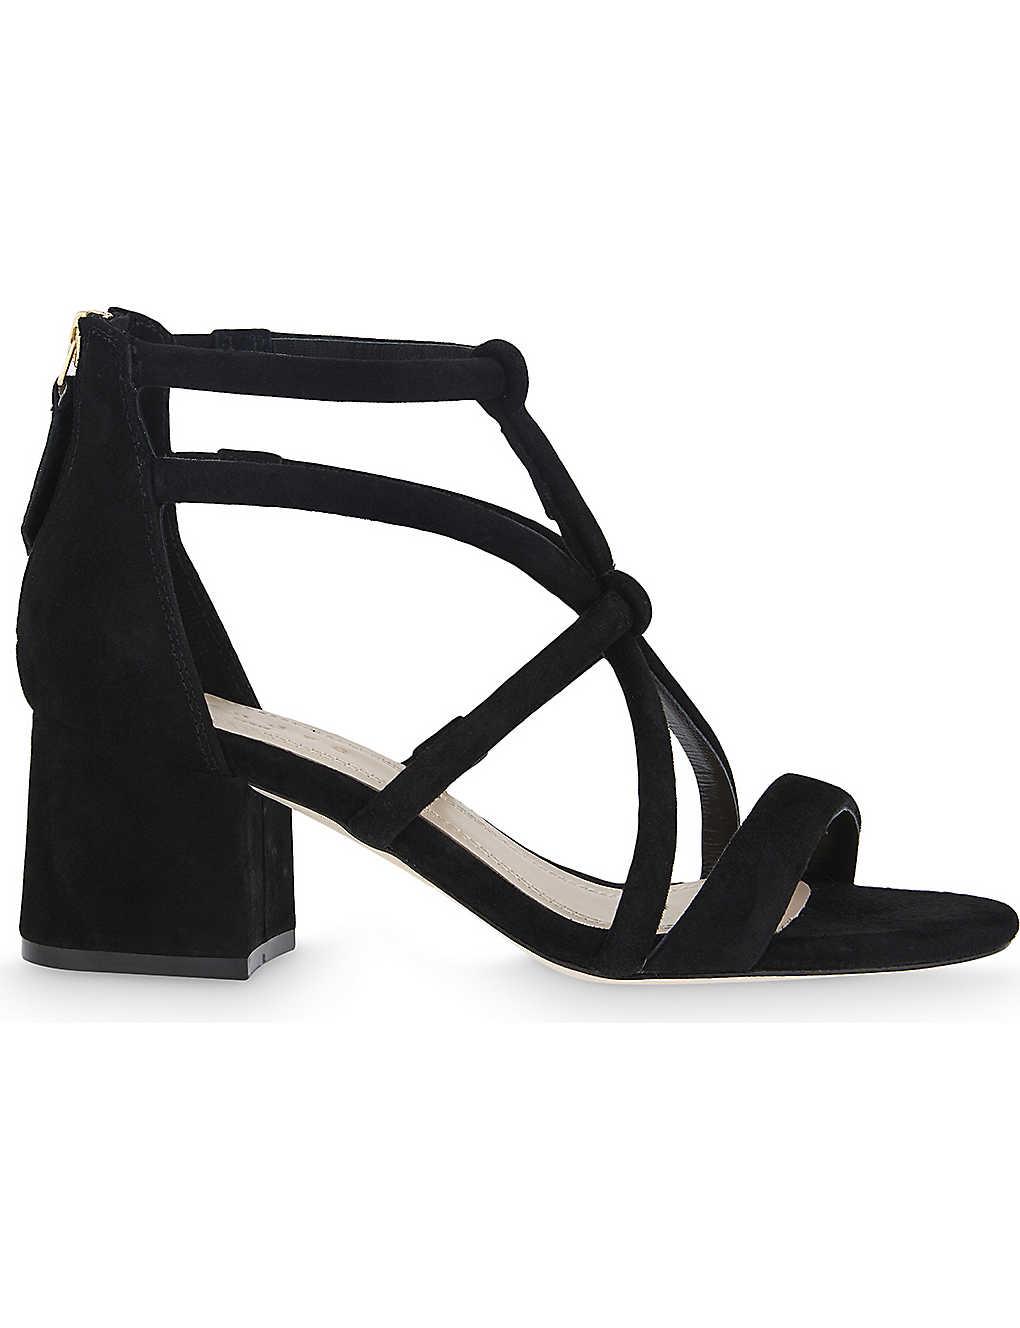 Sandro True Love Suede Sandals